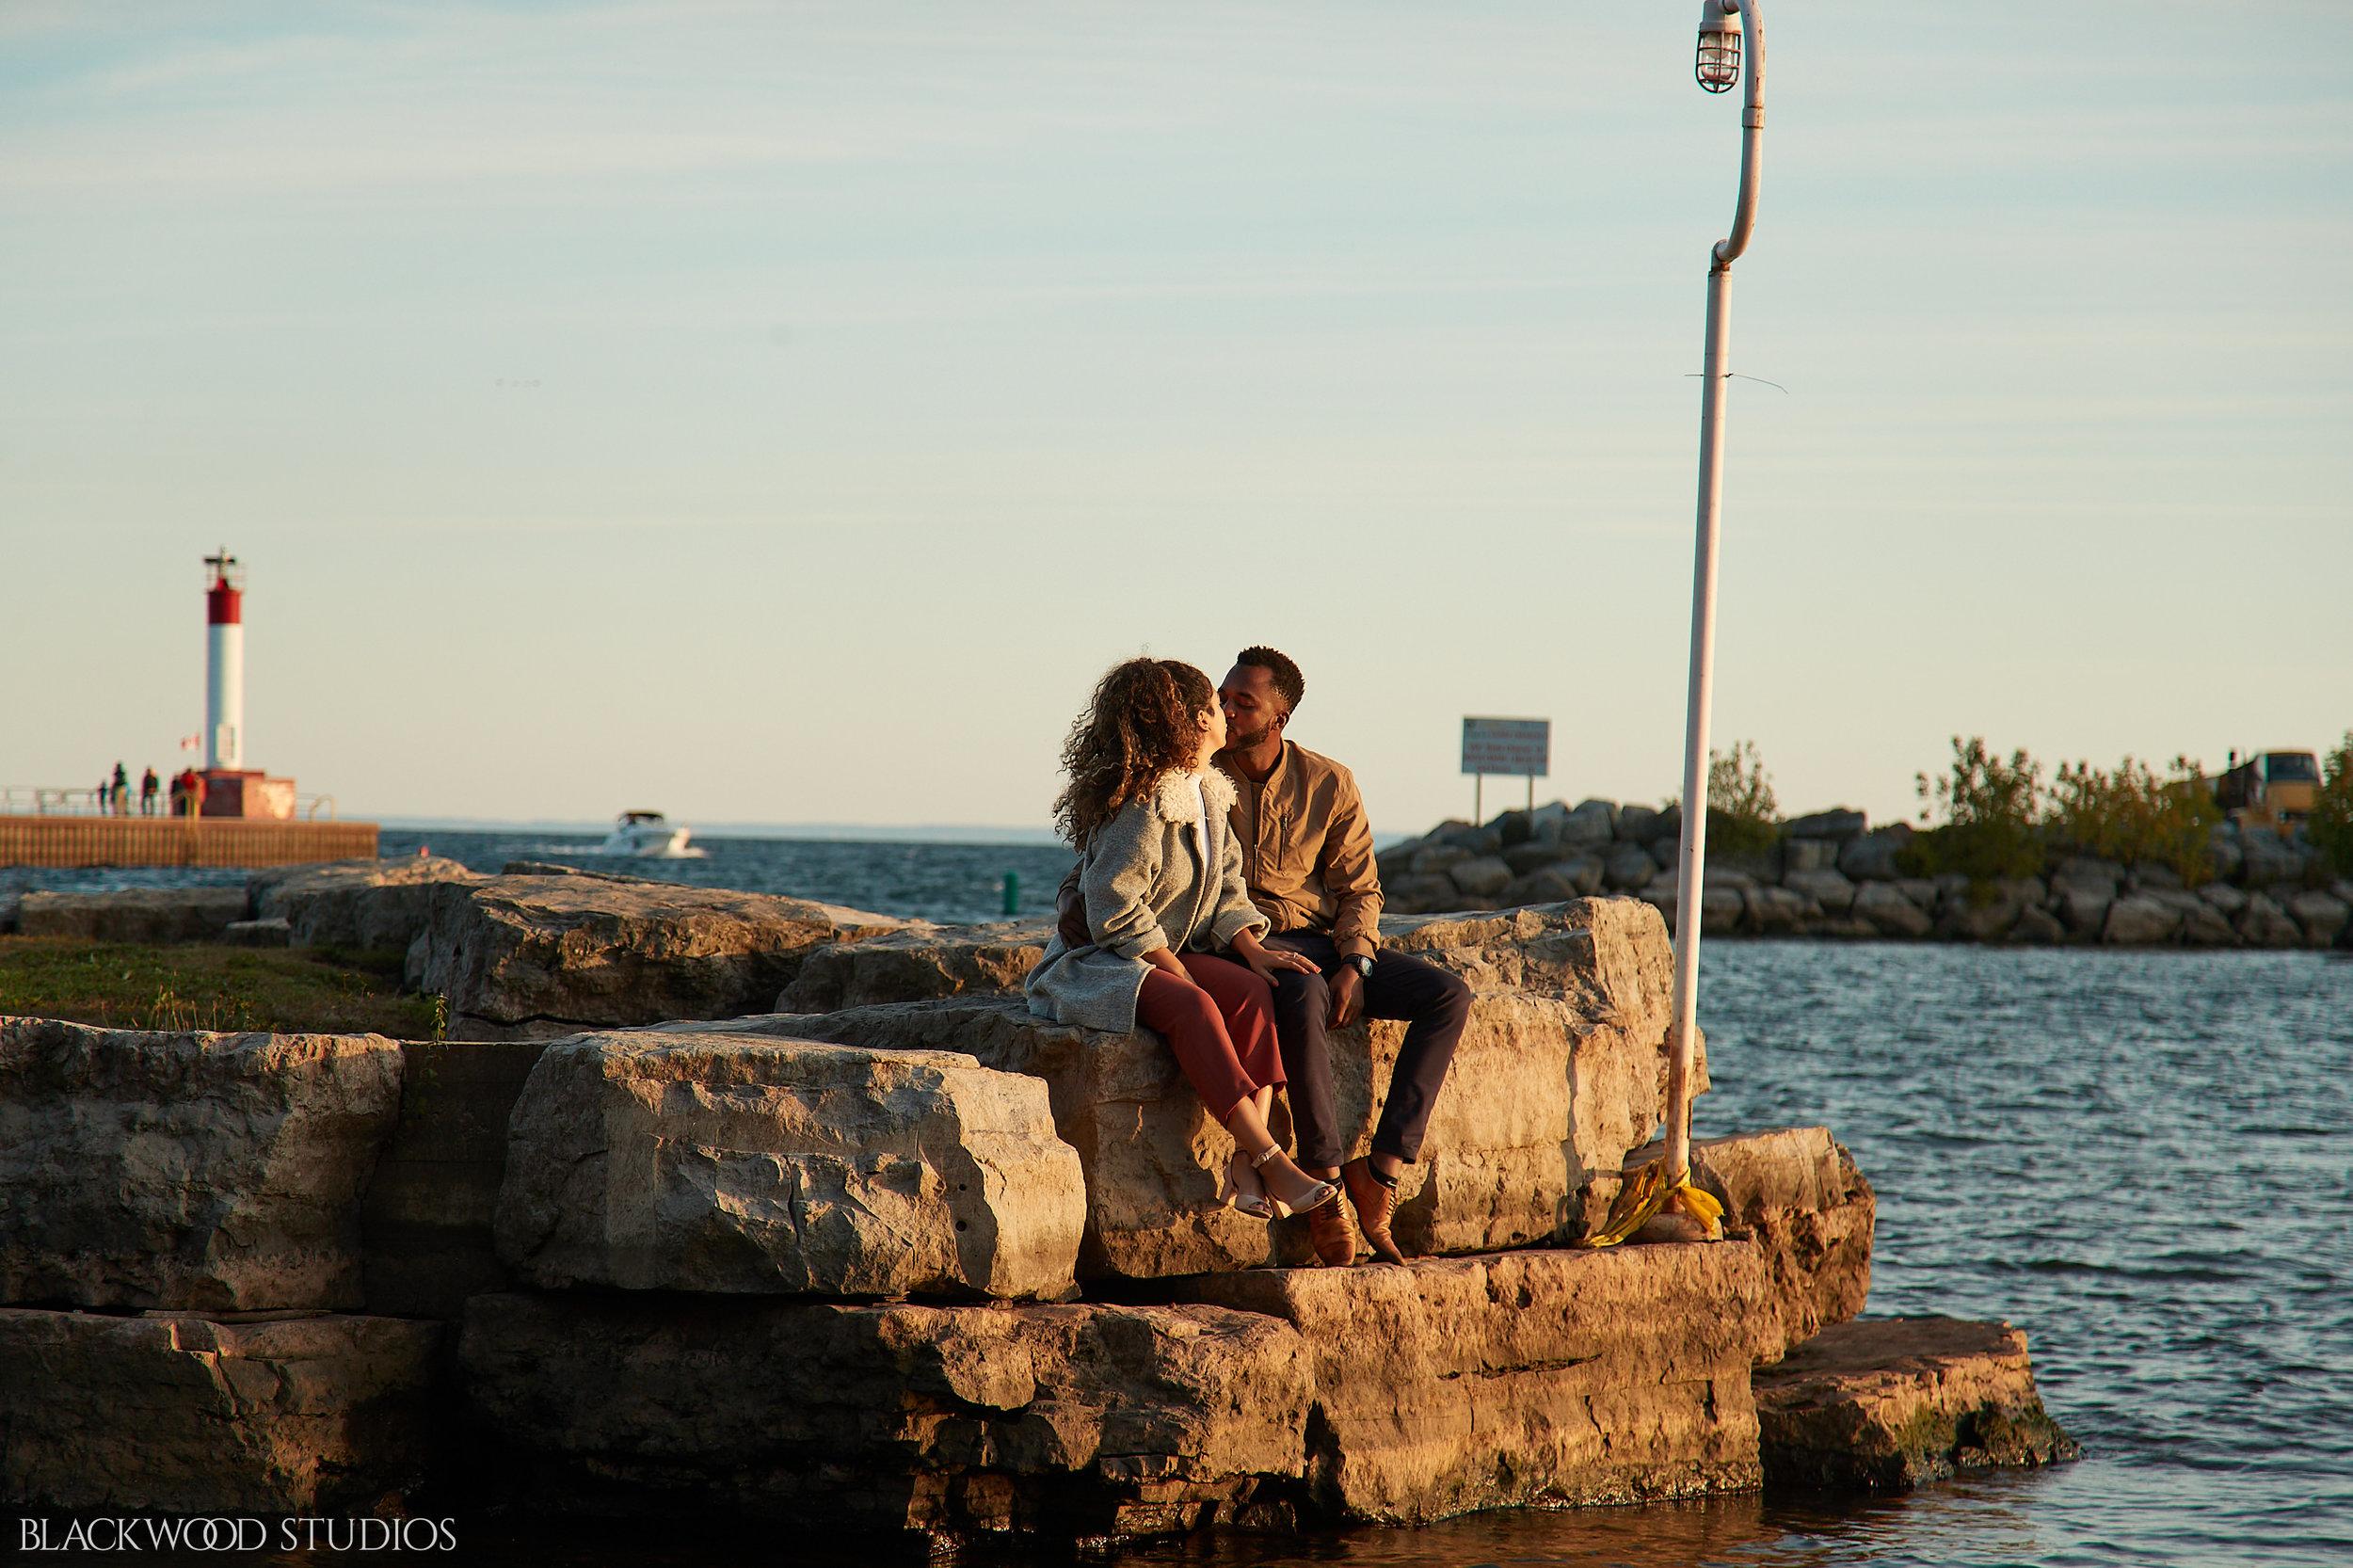 Blackwood-Studios-20181014-180648-Nader-and-Rayane-Engagement-photography-Lakeside-Park-Oakville-Ontario-Canada.jpg